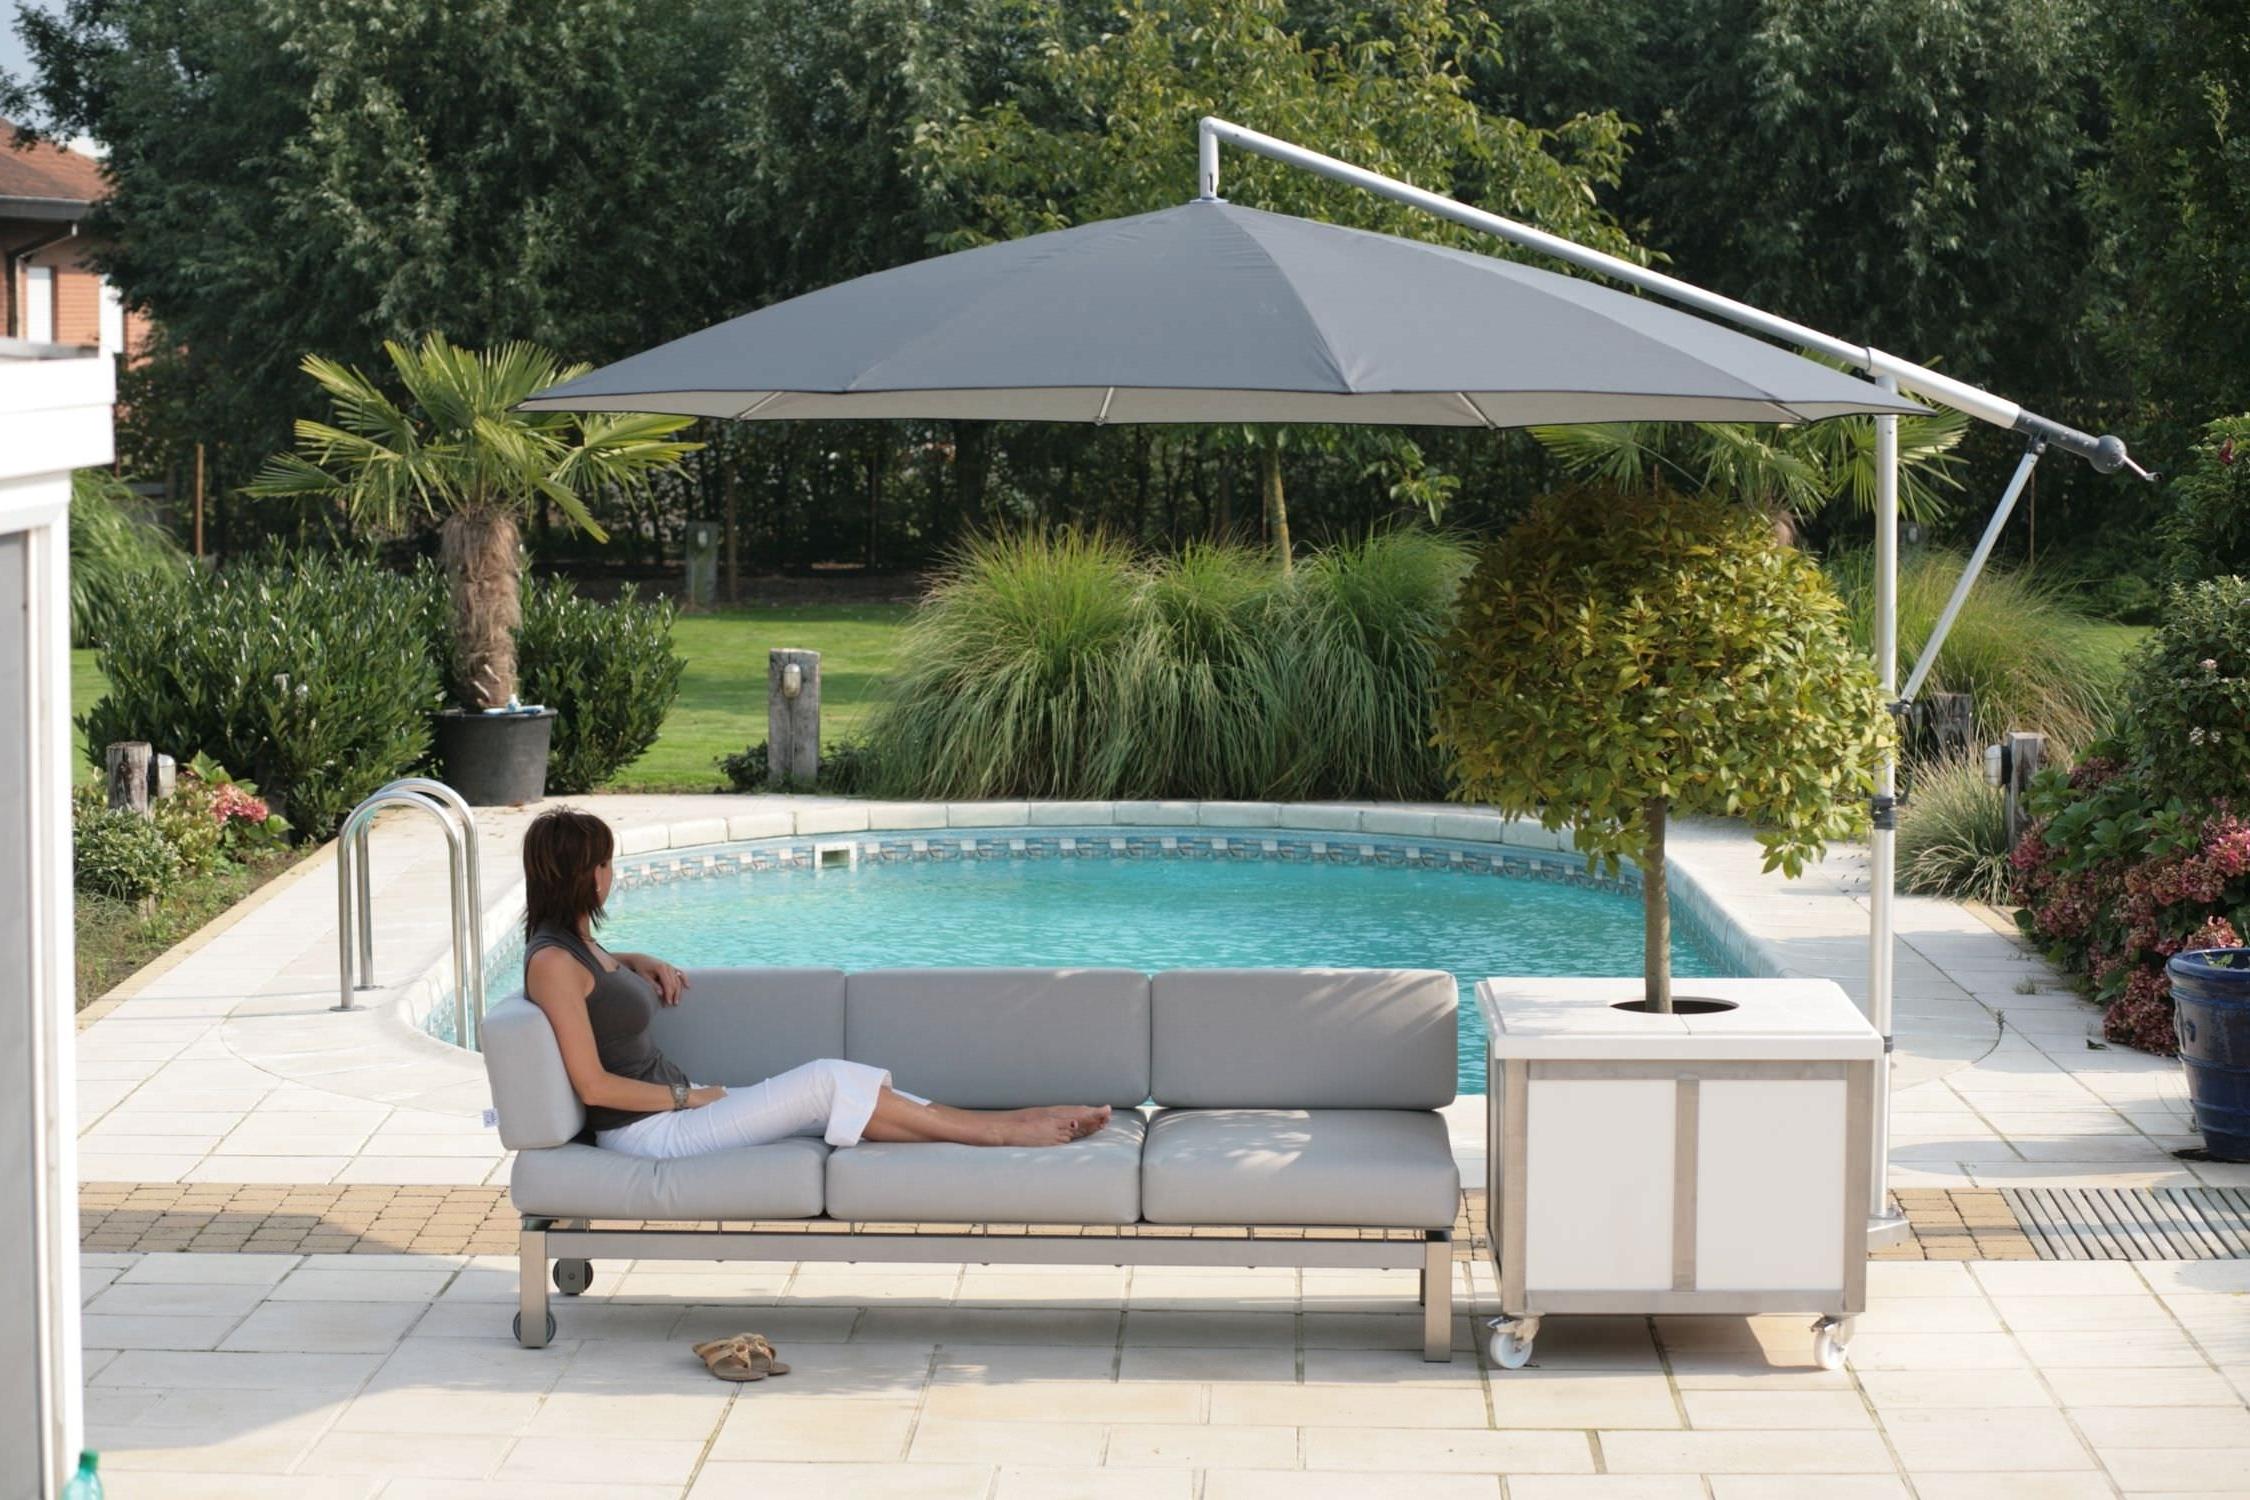 Outdoor Patio Umbrellas Pertaining To 2018 Offset Sun Umbrella – Best Outdoor Patio Umbrella (View 11 of 20)